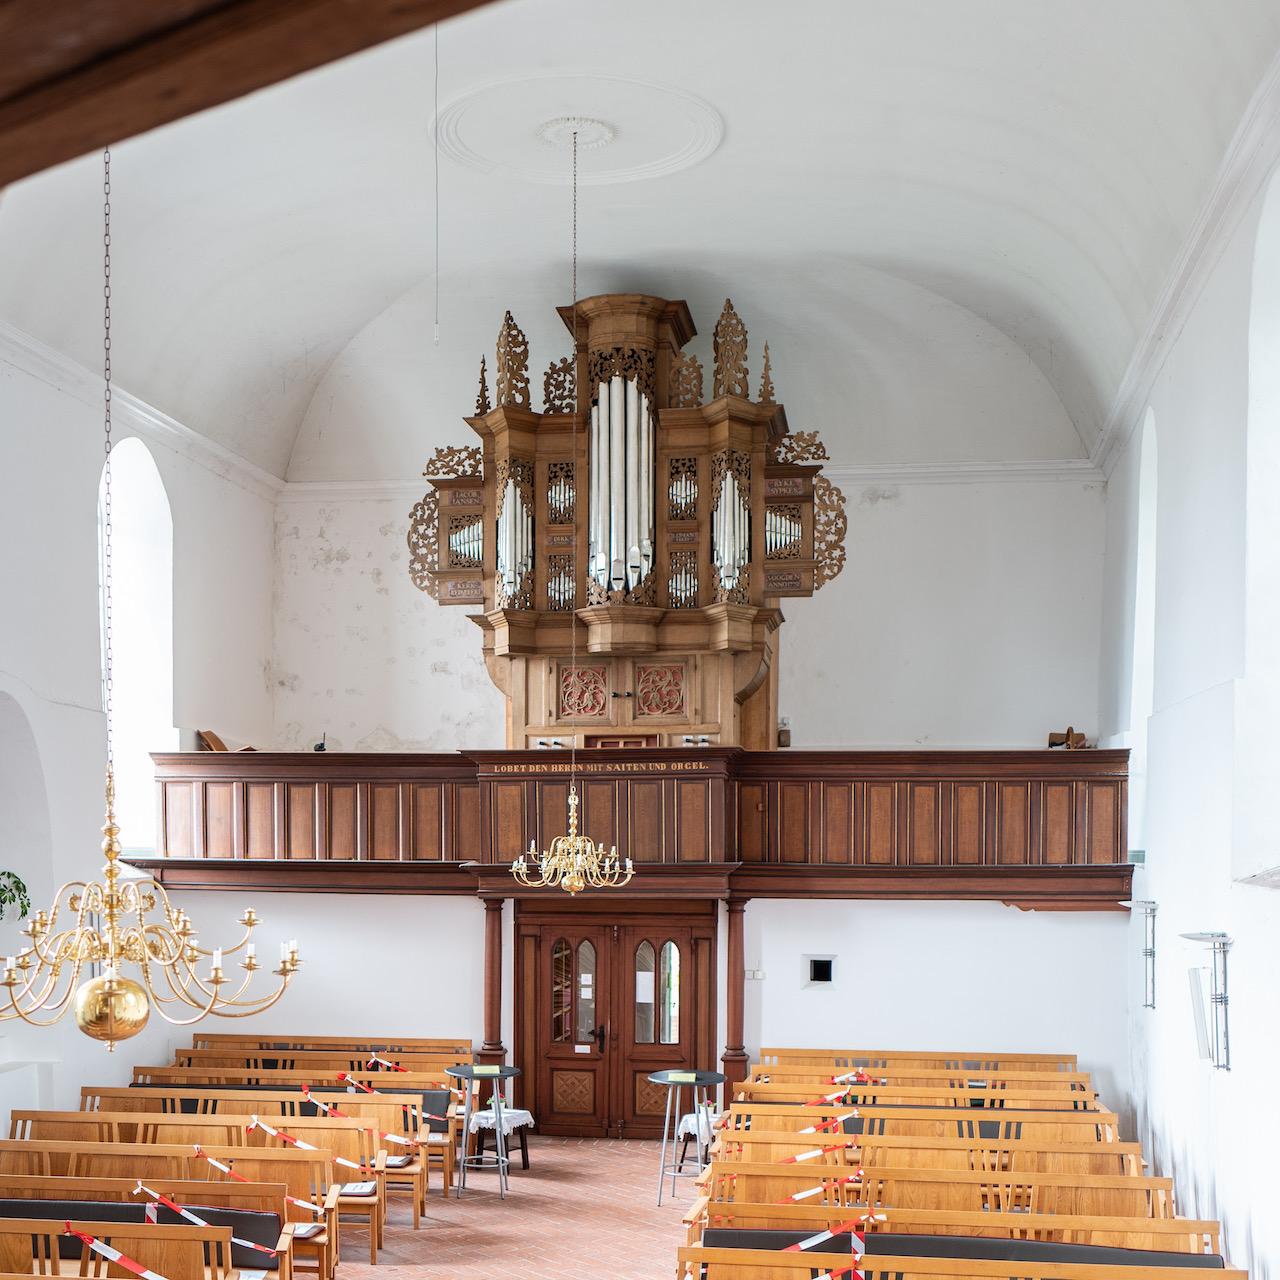 Orgel (Valentin Ulrich Grotian, 1694)